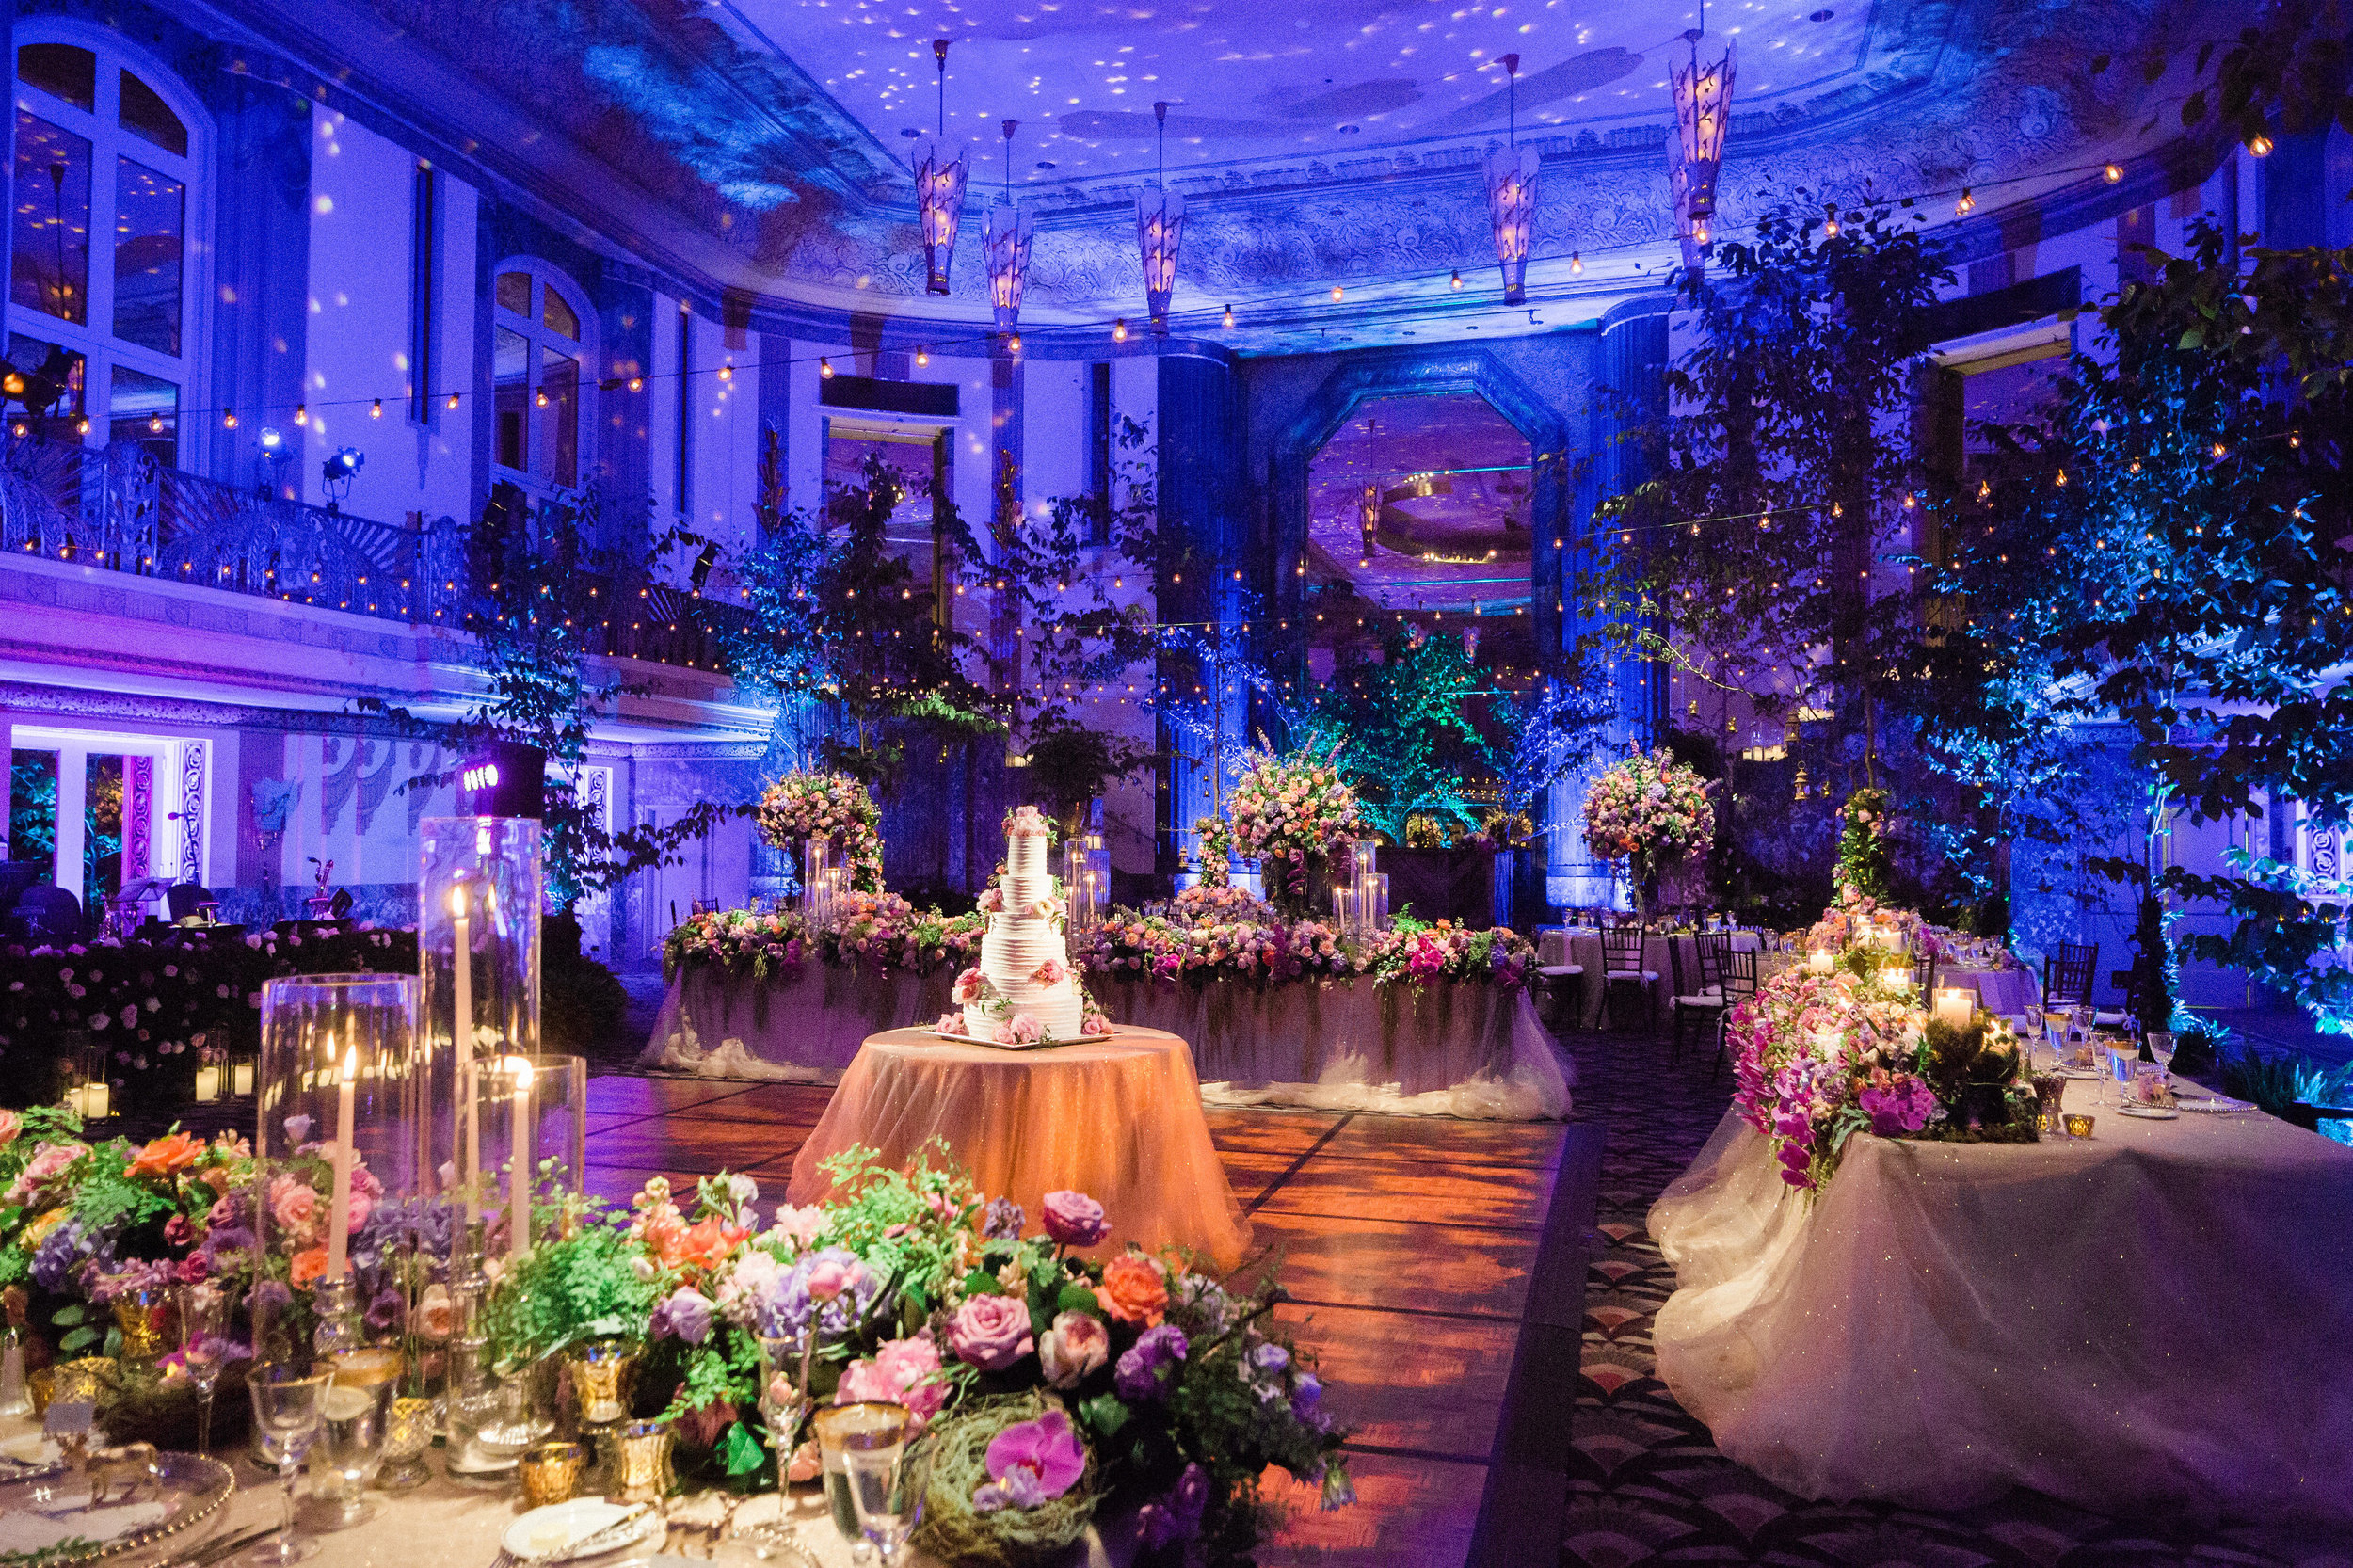 Room Shot at Reception at The Hilton Netherland Plaza Hotel Hall of Mirros Cincinnati, OH